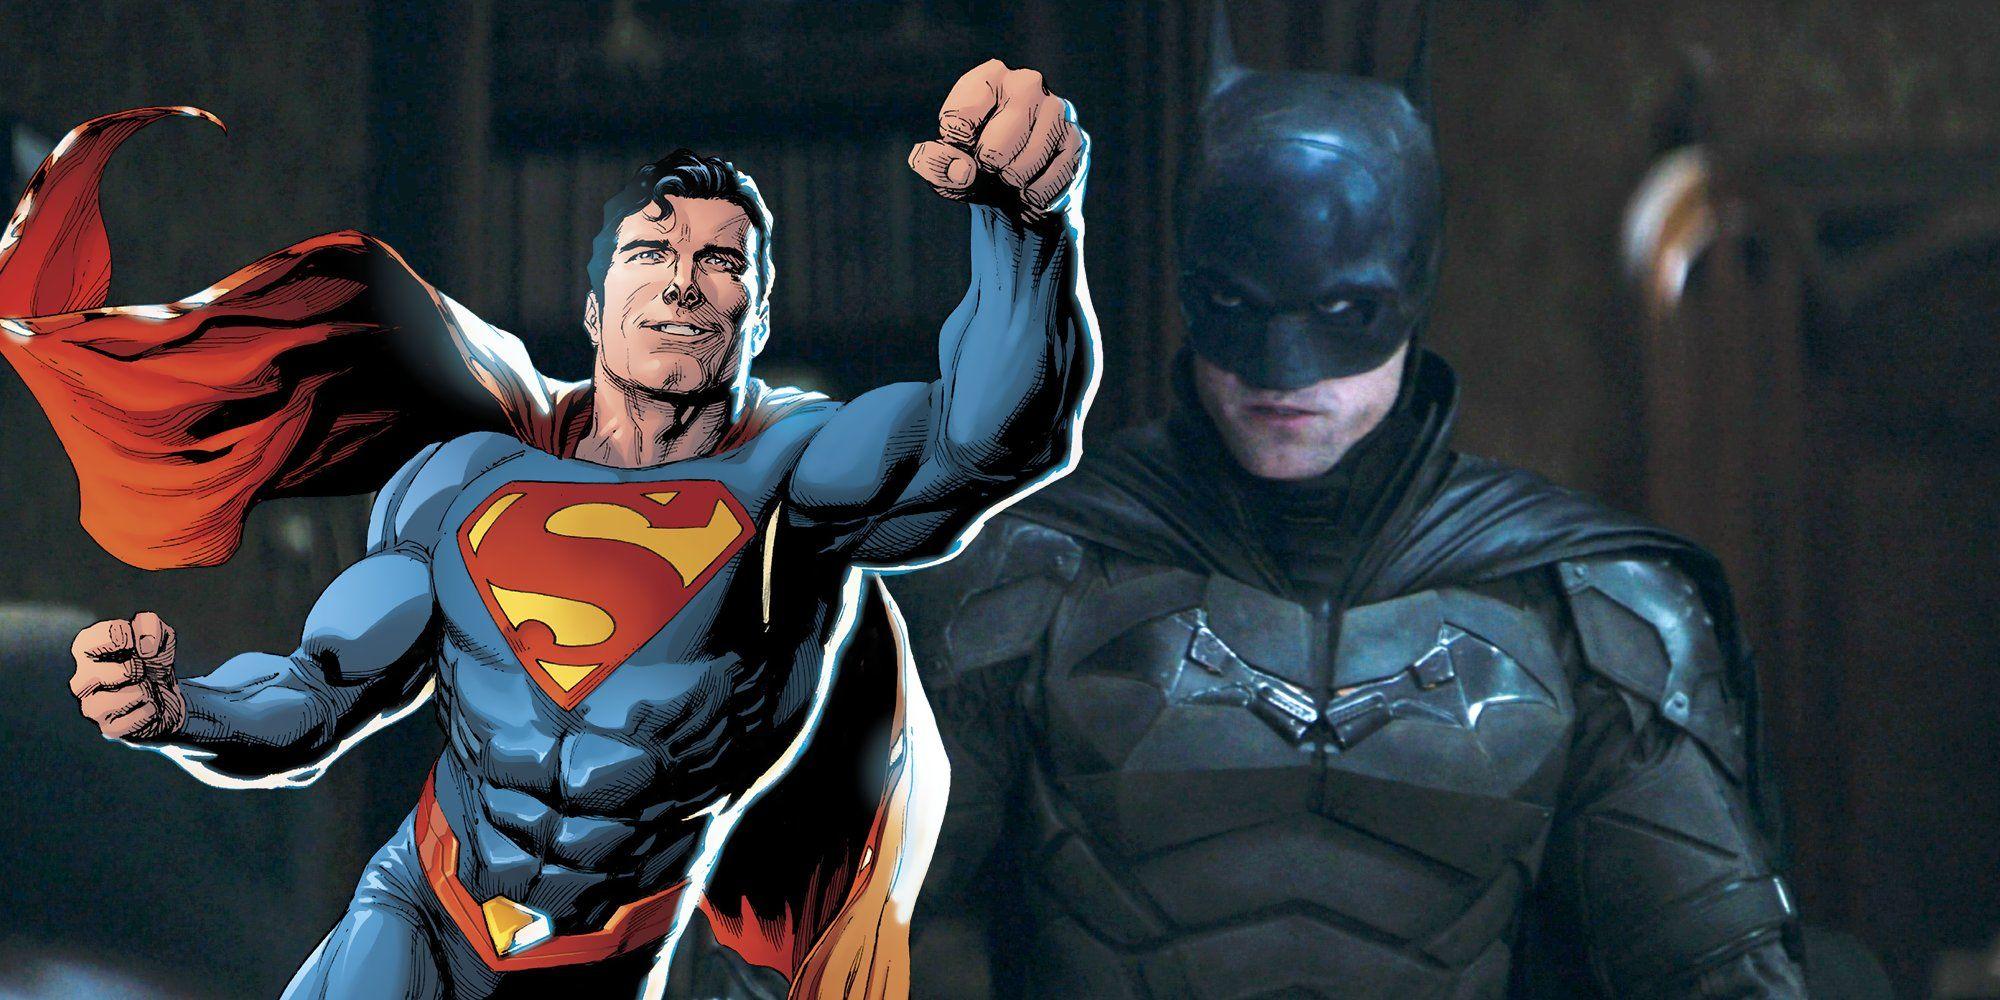 Robert Pattinson as Batman with DC Comics Superman in The Batman.'